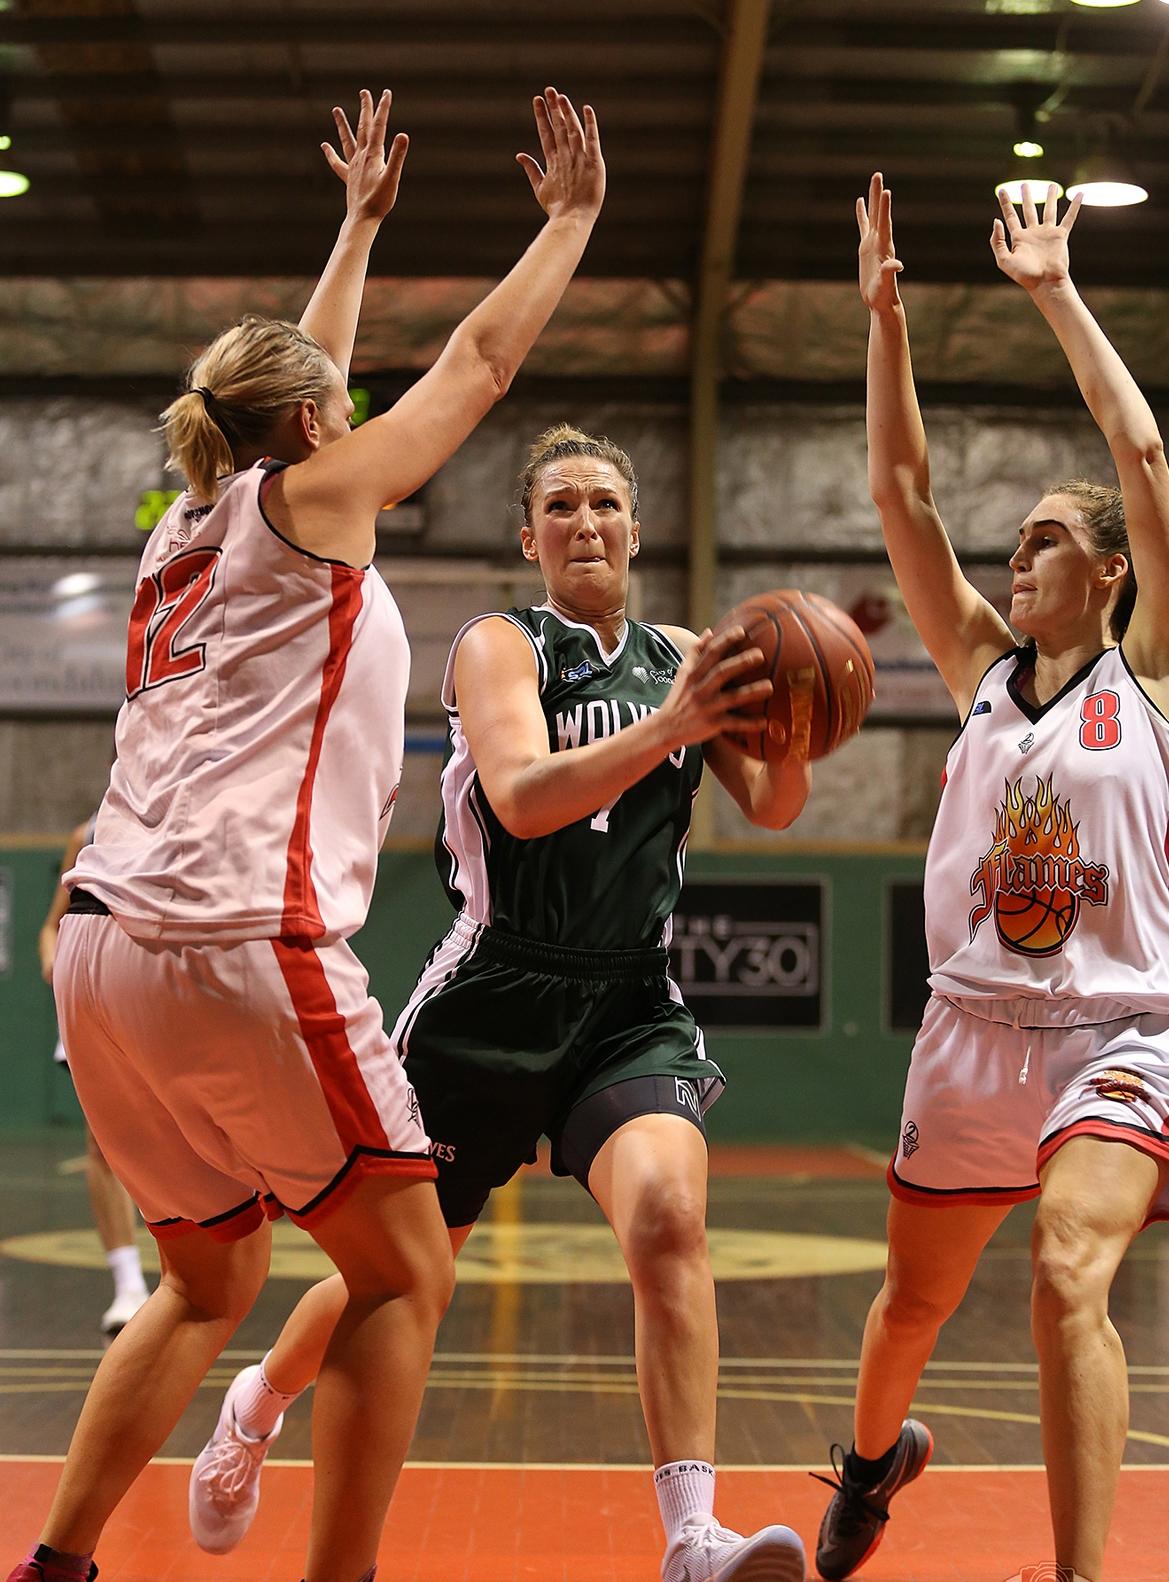 Klara Wischer was dominant. Picture: Michael Farnell, sportsimagery.com.au